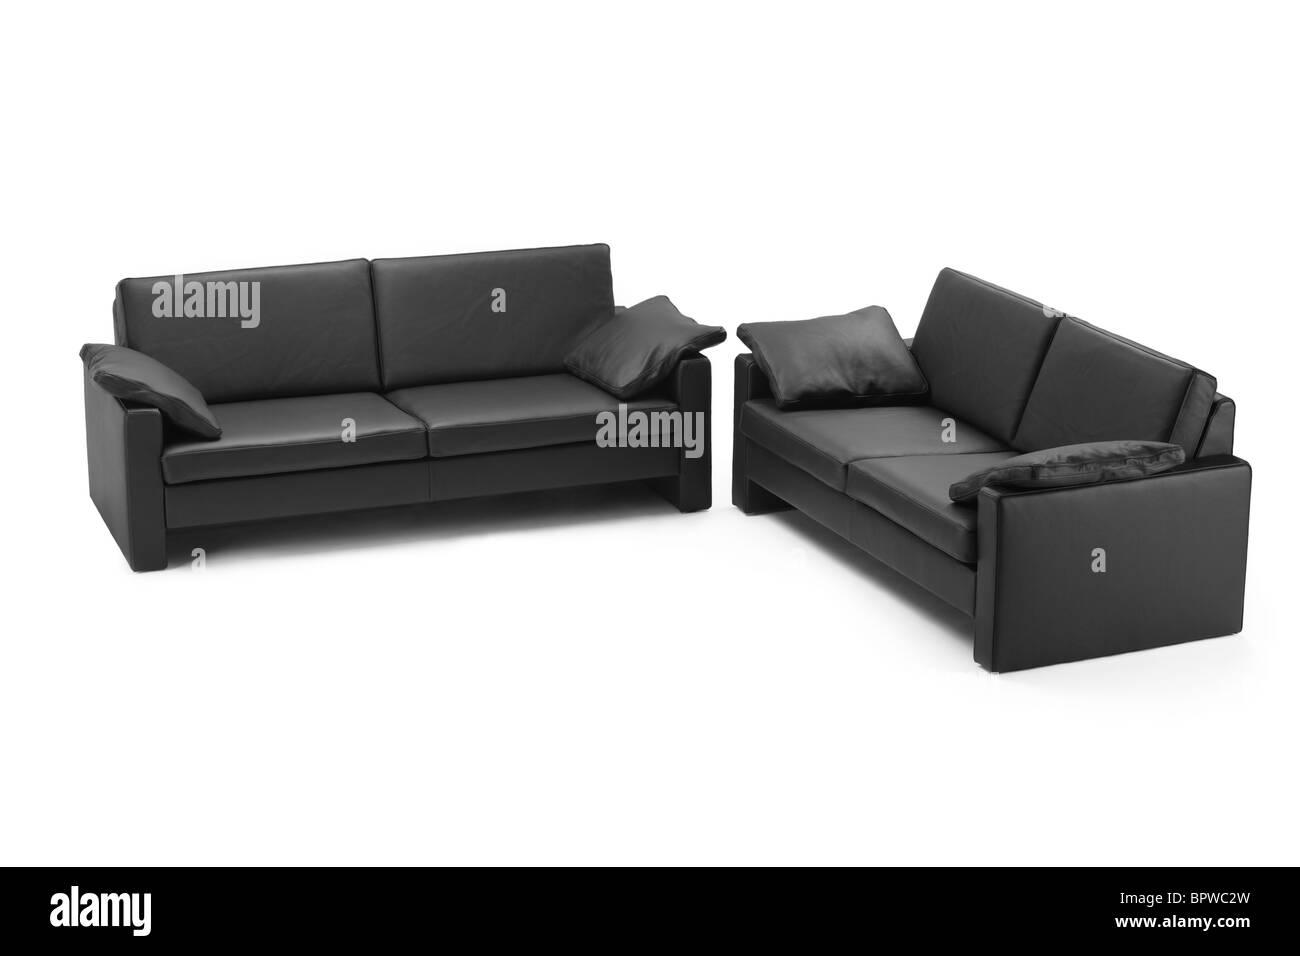 Black leathered furniture - Stock Image